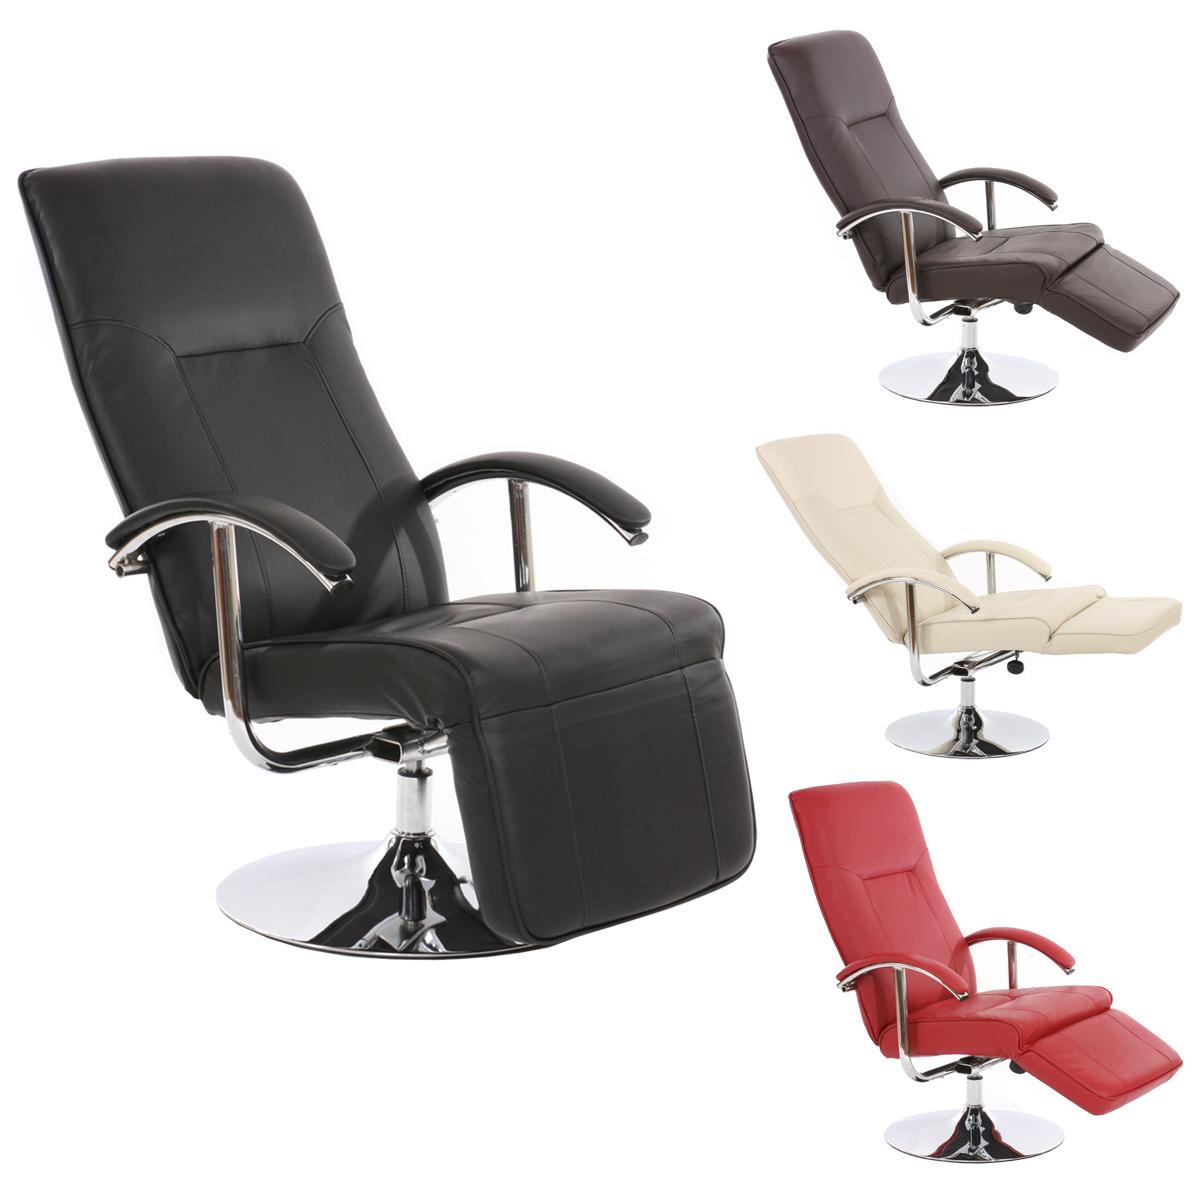 relaxliege leder braun perfect cheap full size of modernes haus relaxliege wohnzimmer braun. Black Bedroom Furniture Sets. Home Design Ideas